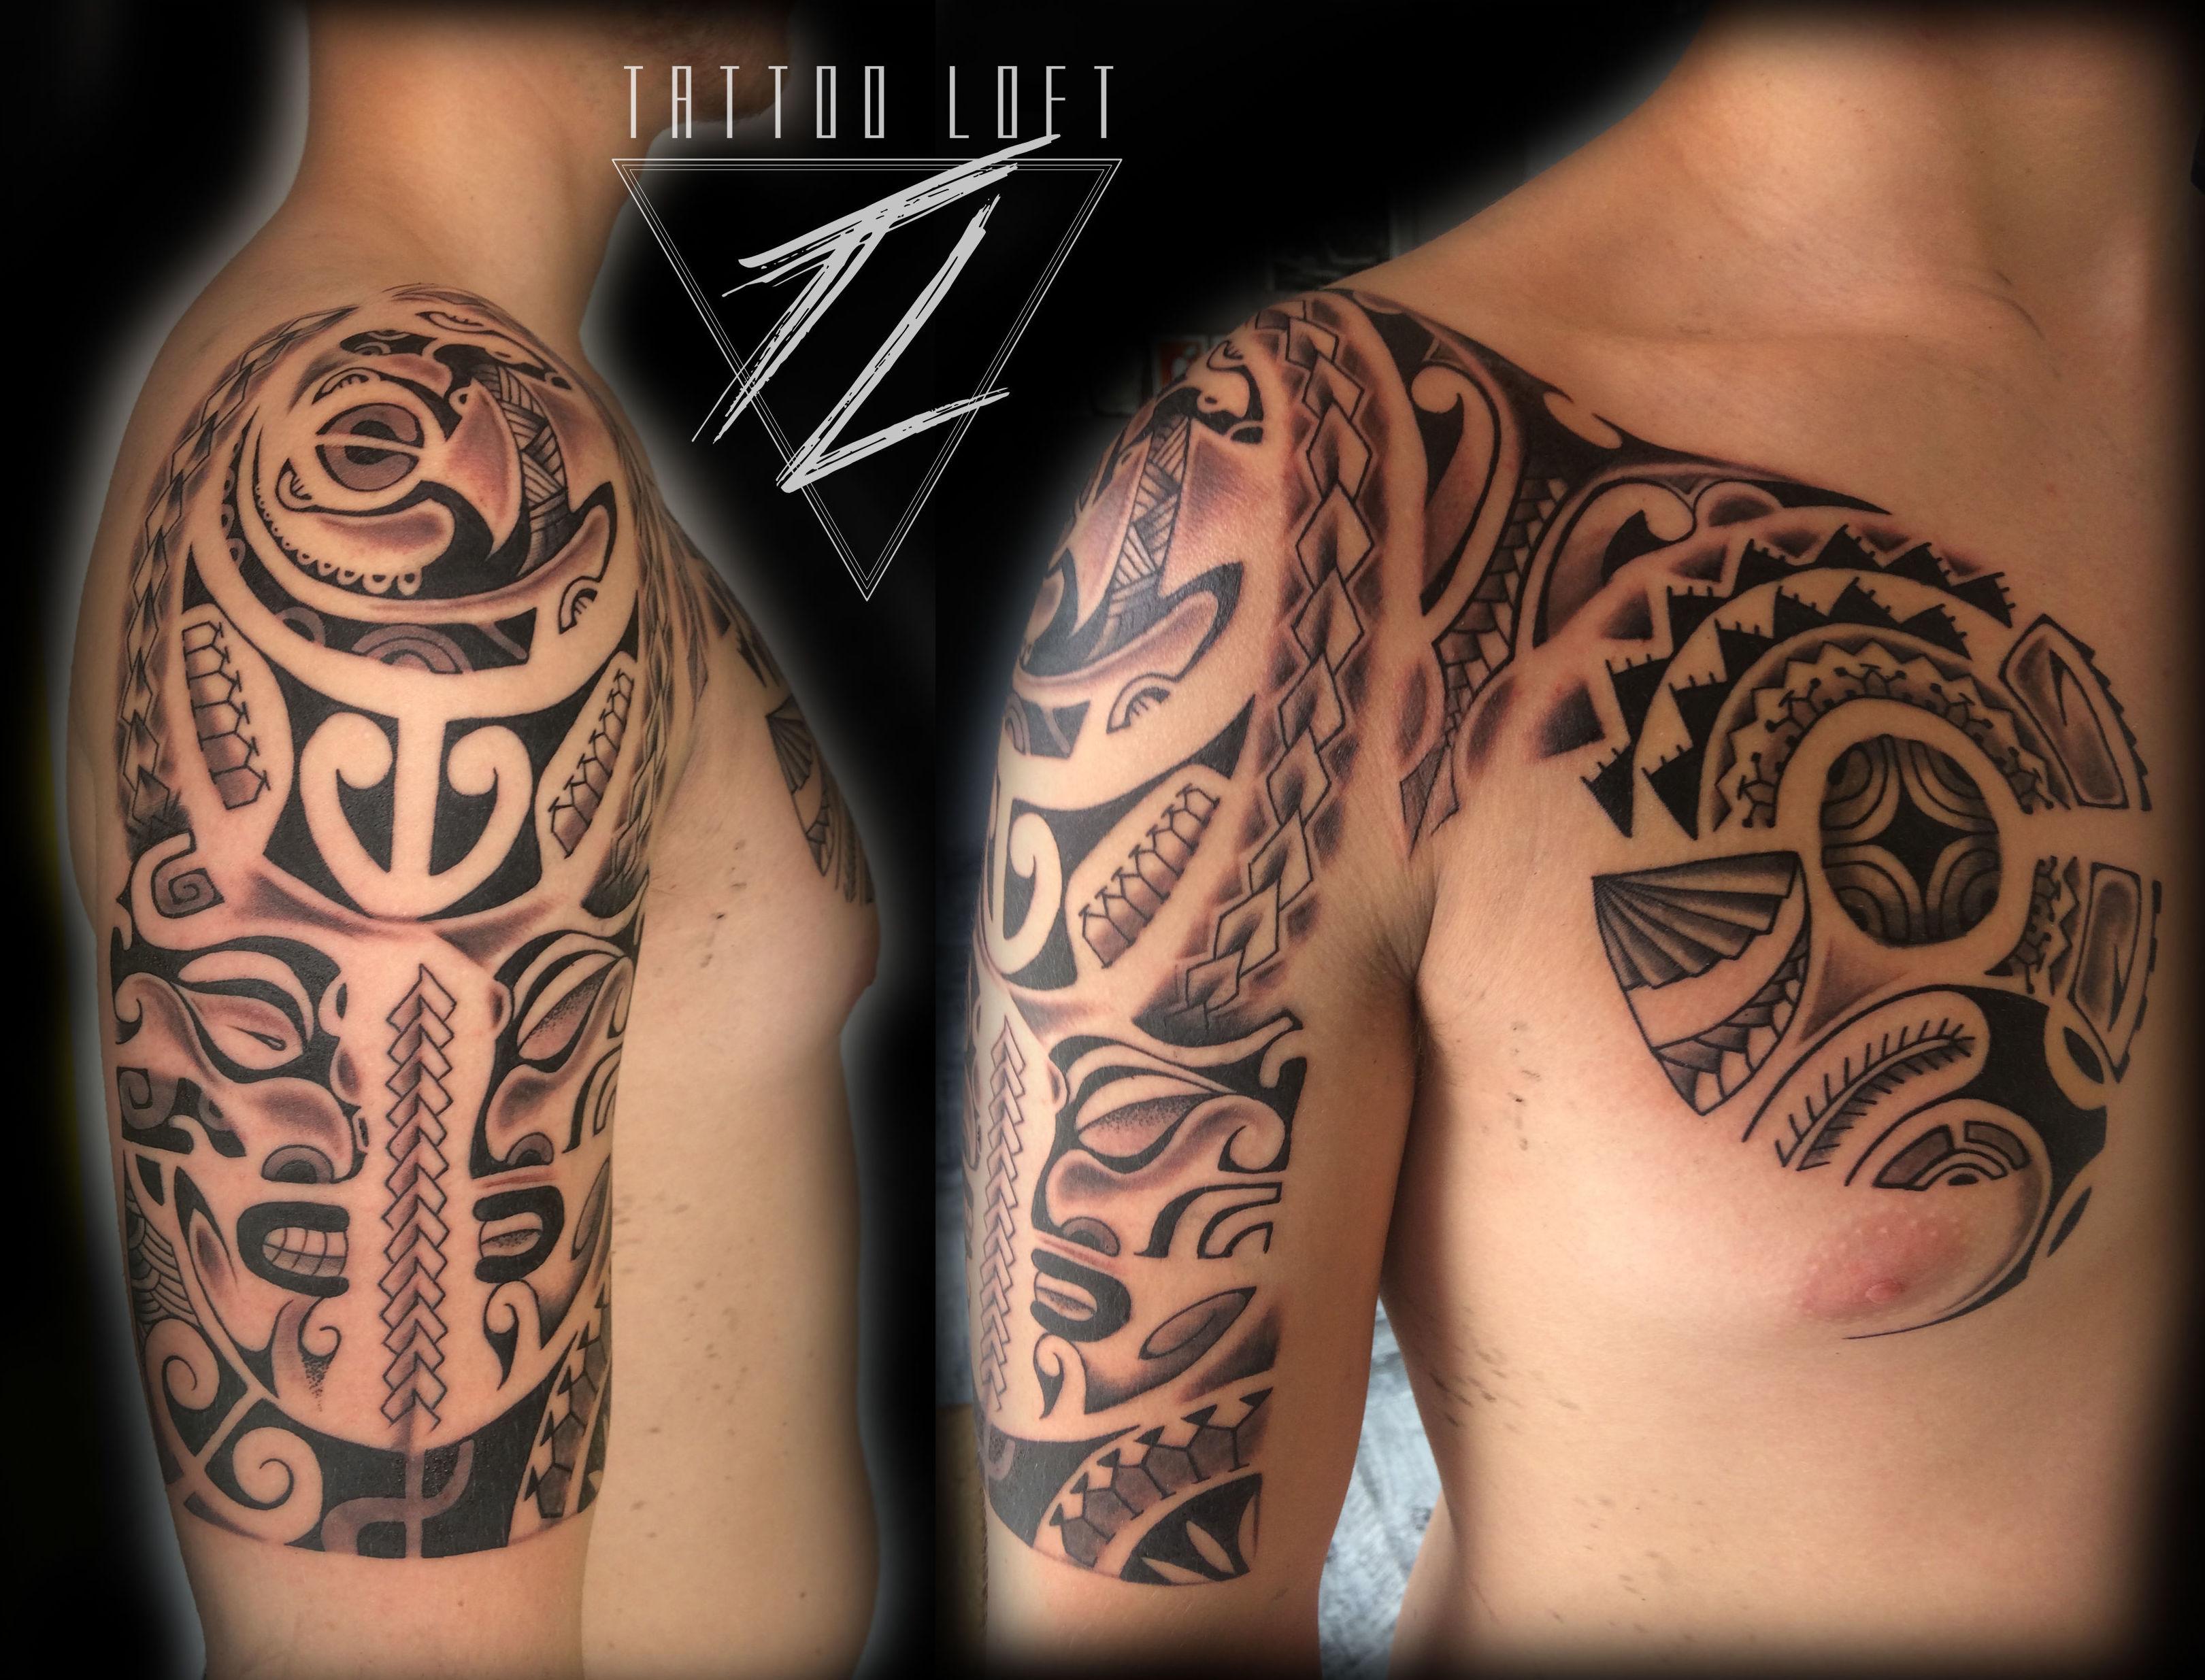 Tatuaje polinesio en Carabanchel